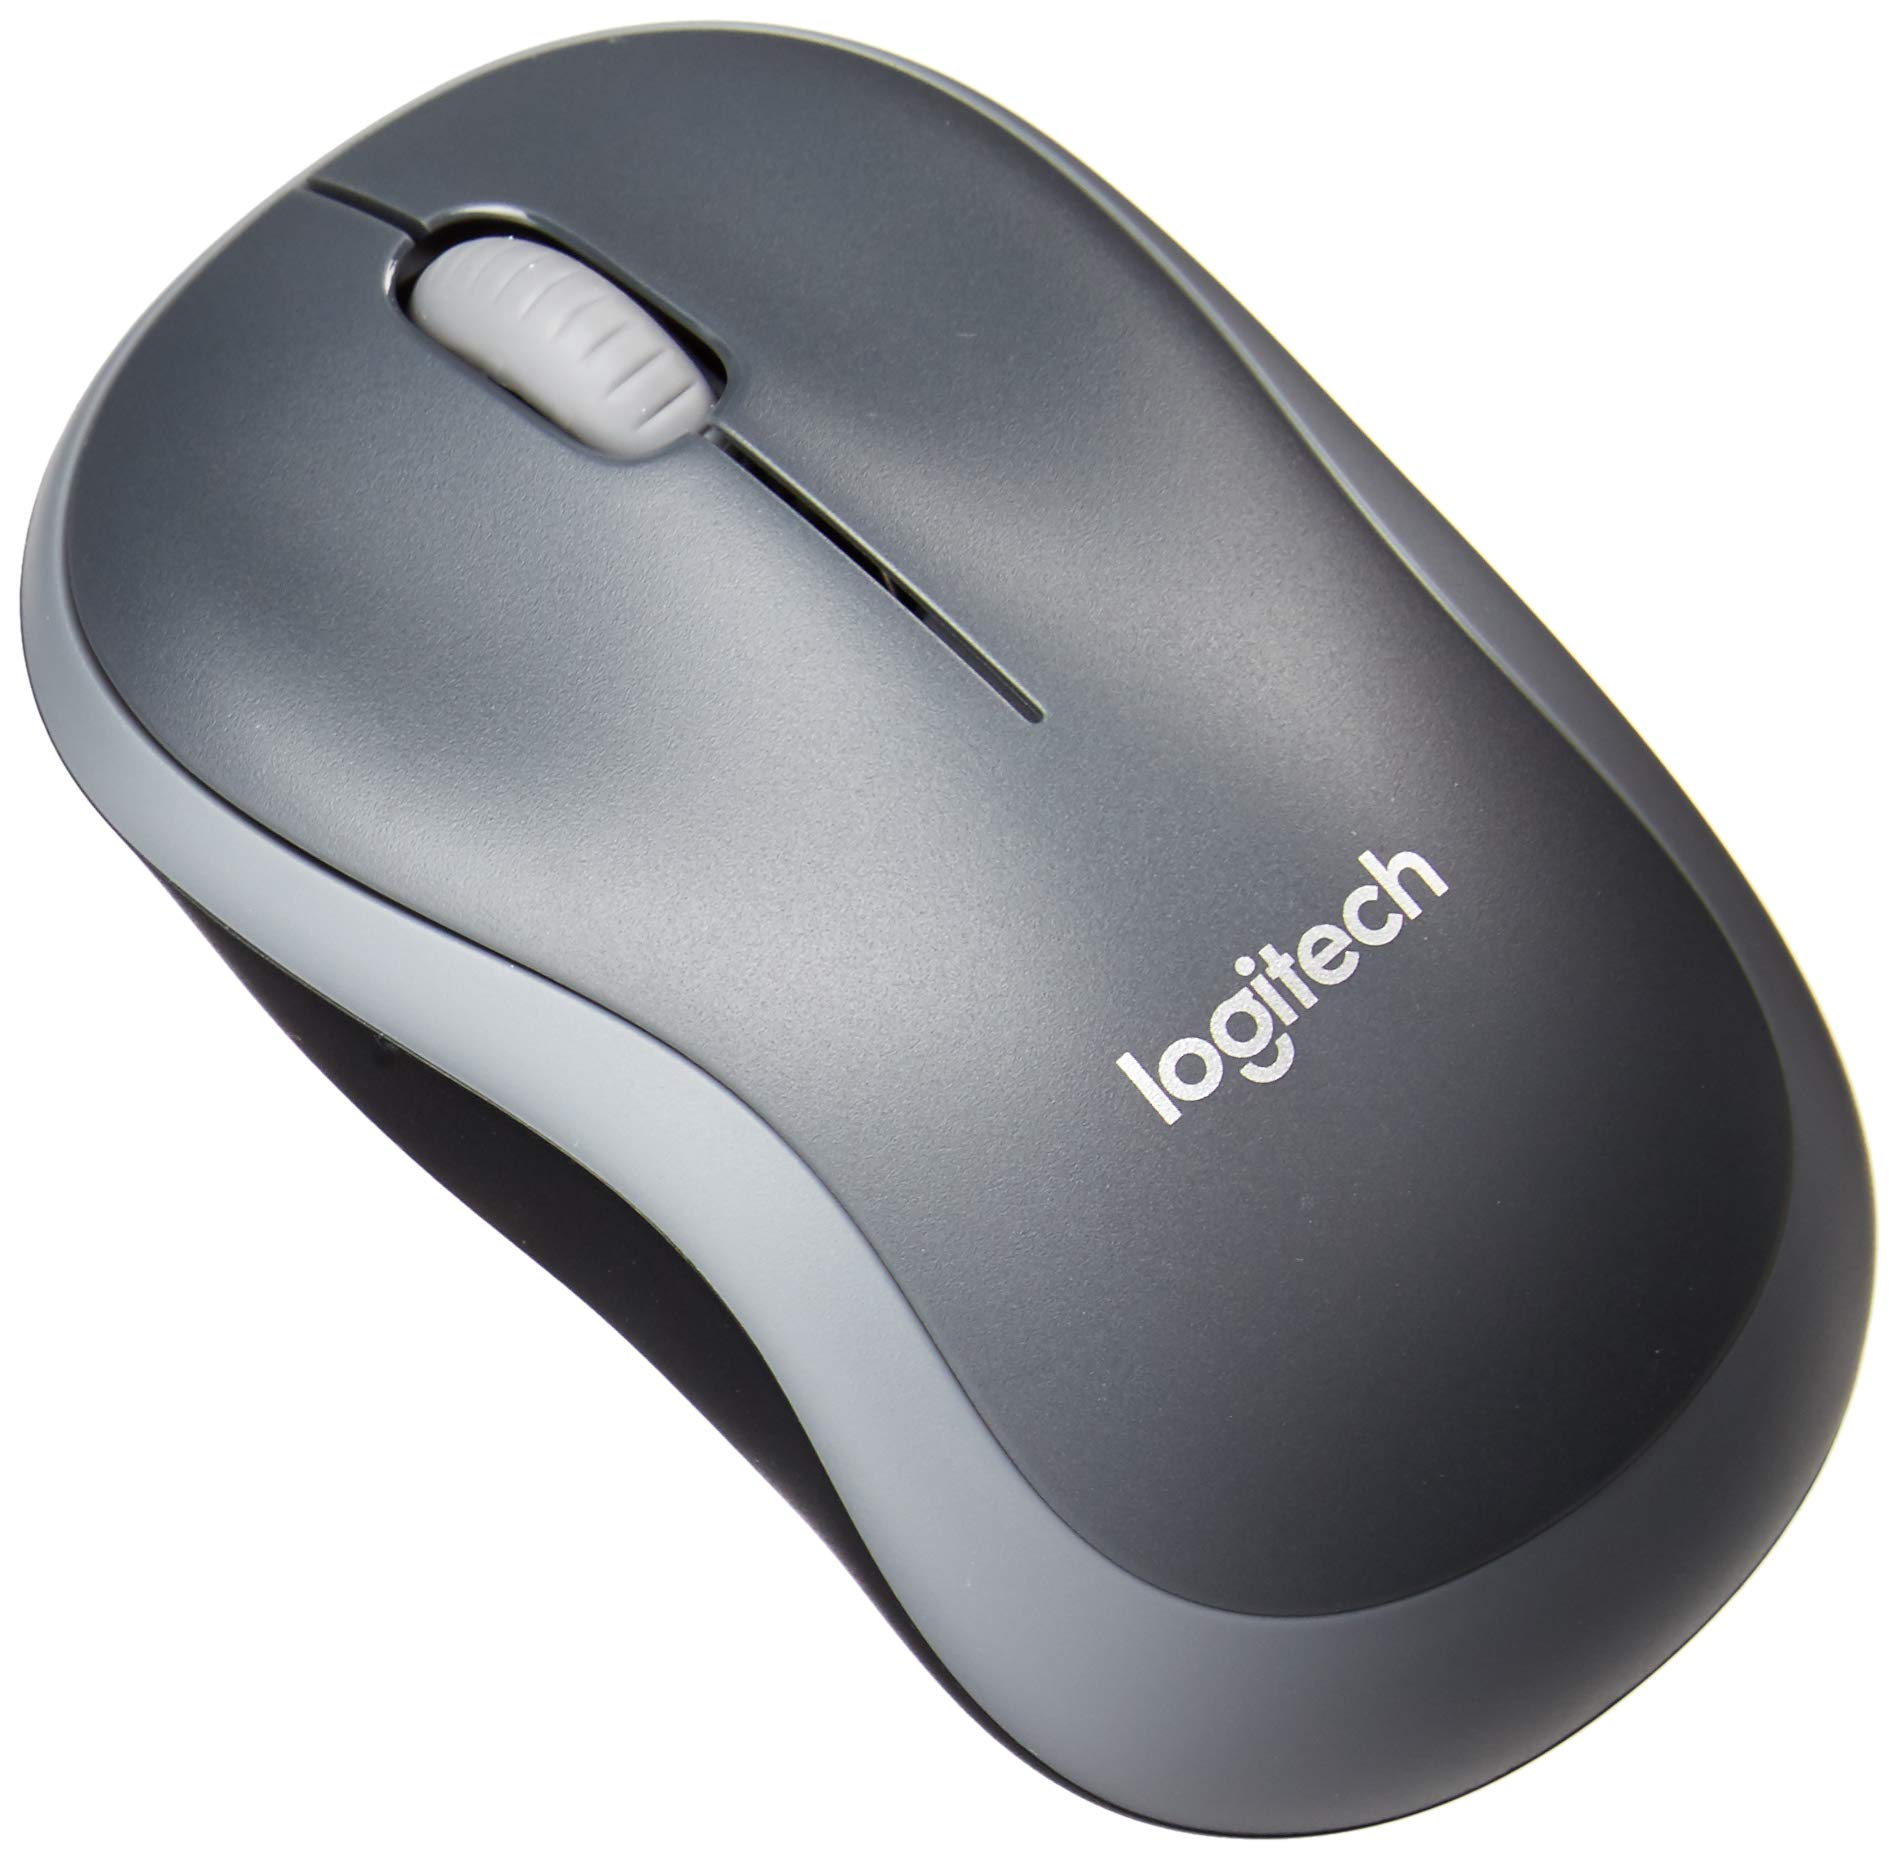 Logitech Wireless Mouse M185 (Swift Grey)